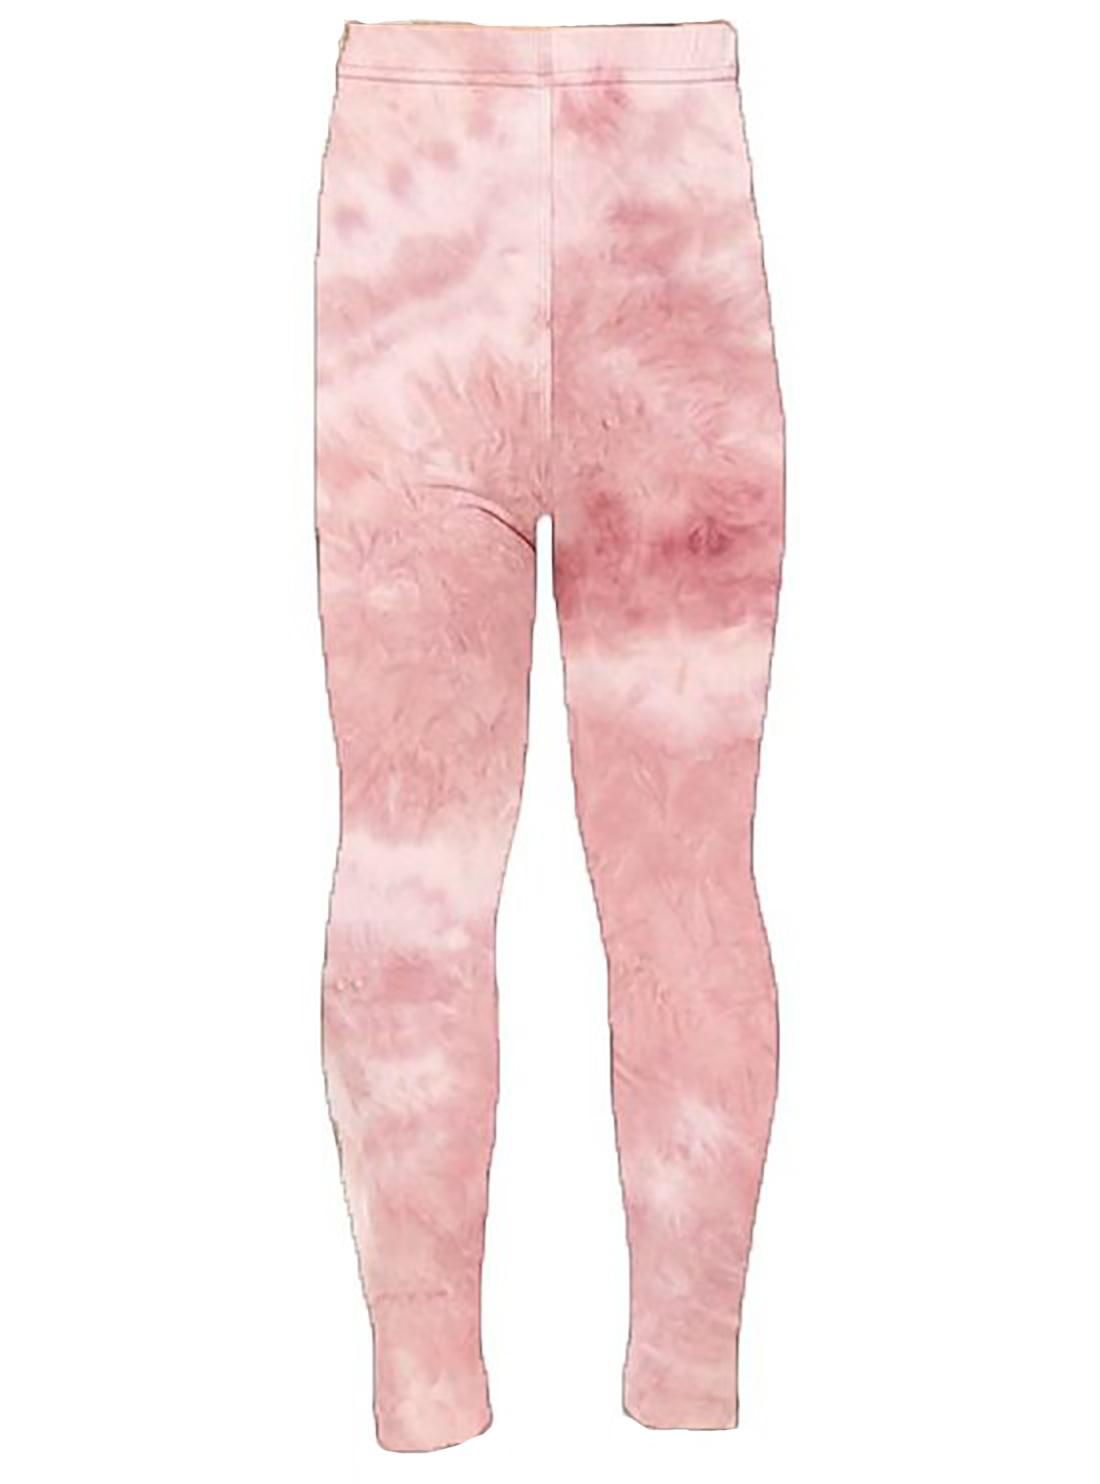 Lola mini tie dye leggings